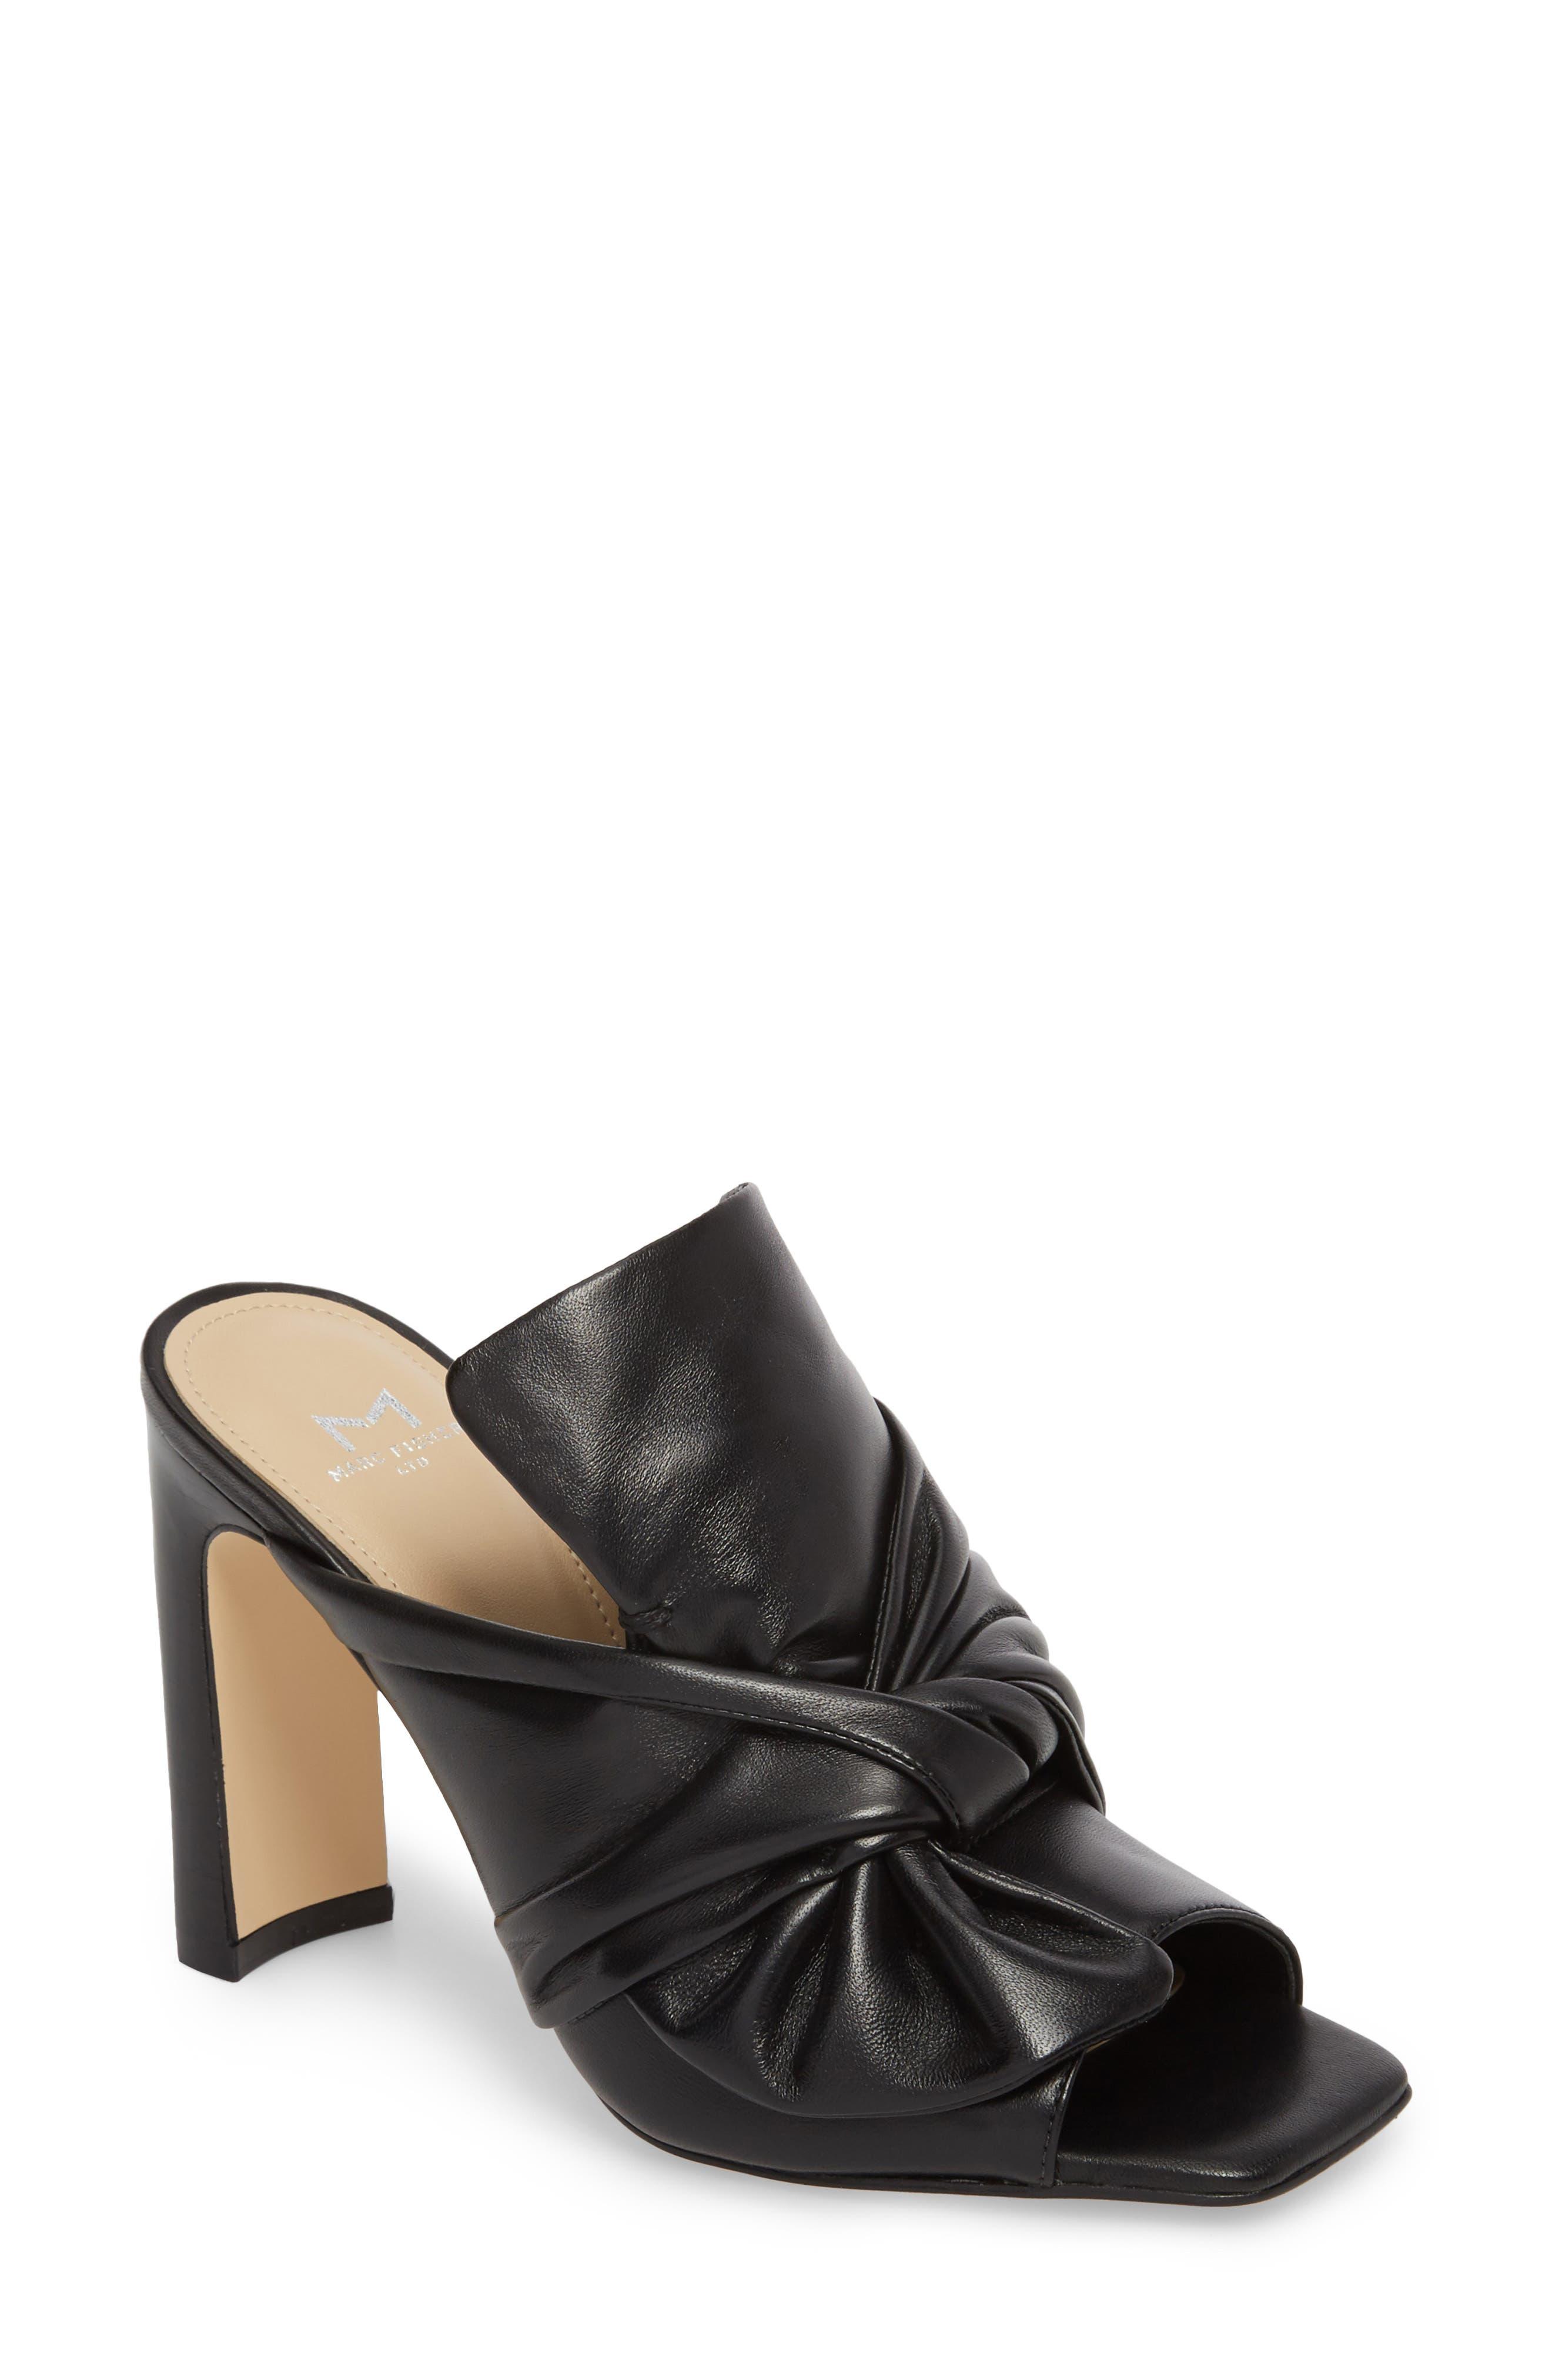 Hogan Sandal,                         Main,                         color, Black Leather